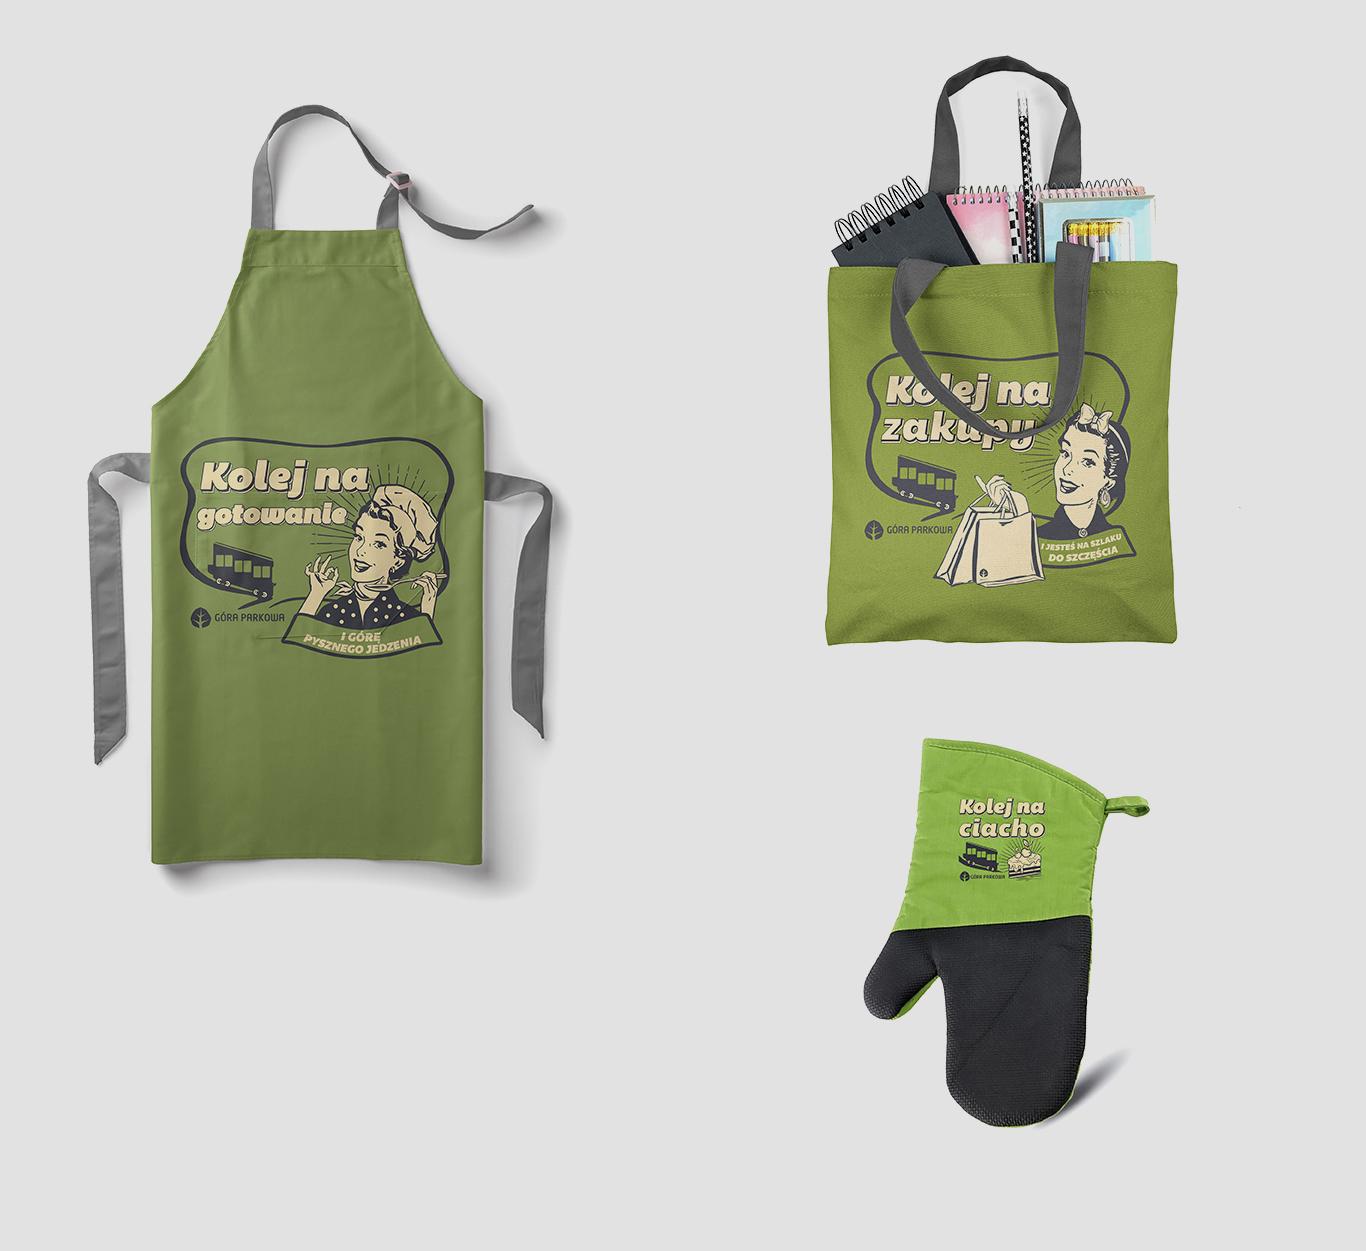 akcydensy pkl fartuch, rękawica kuchenna torba